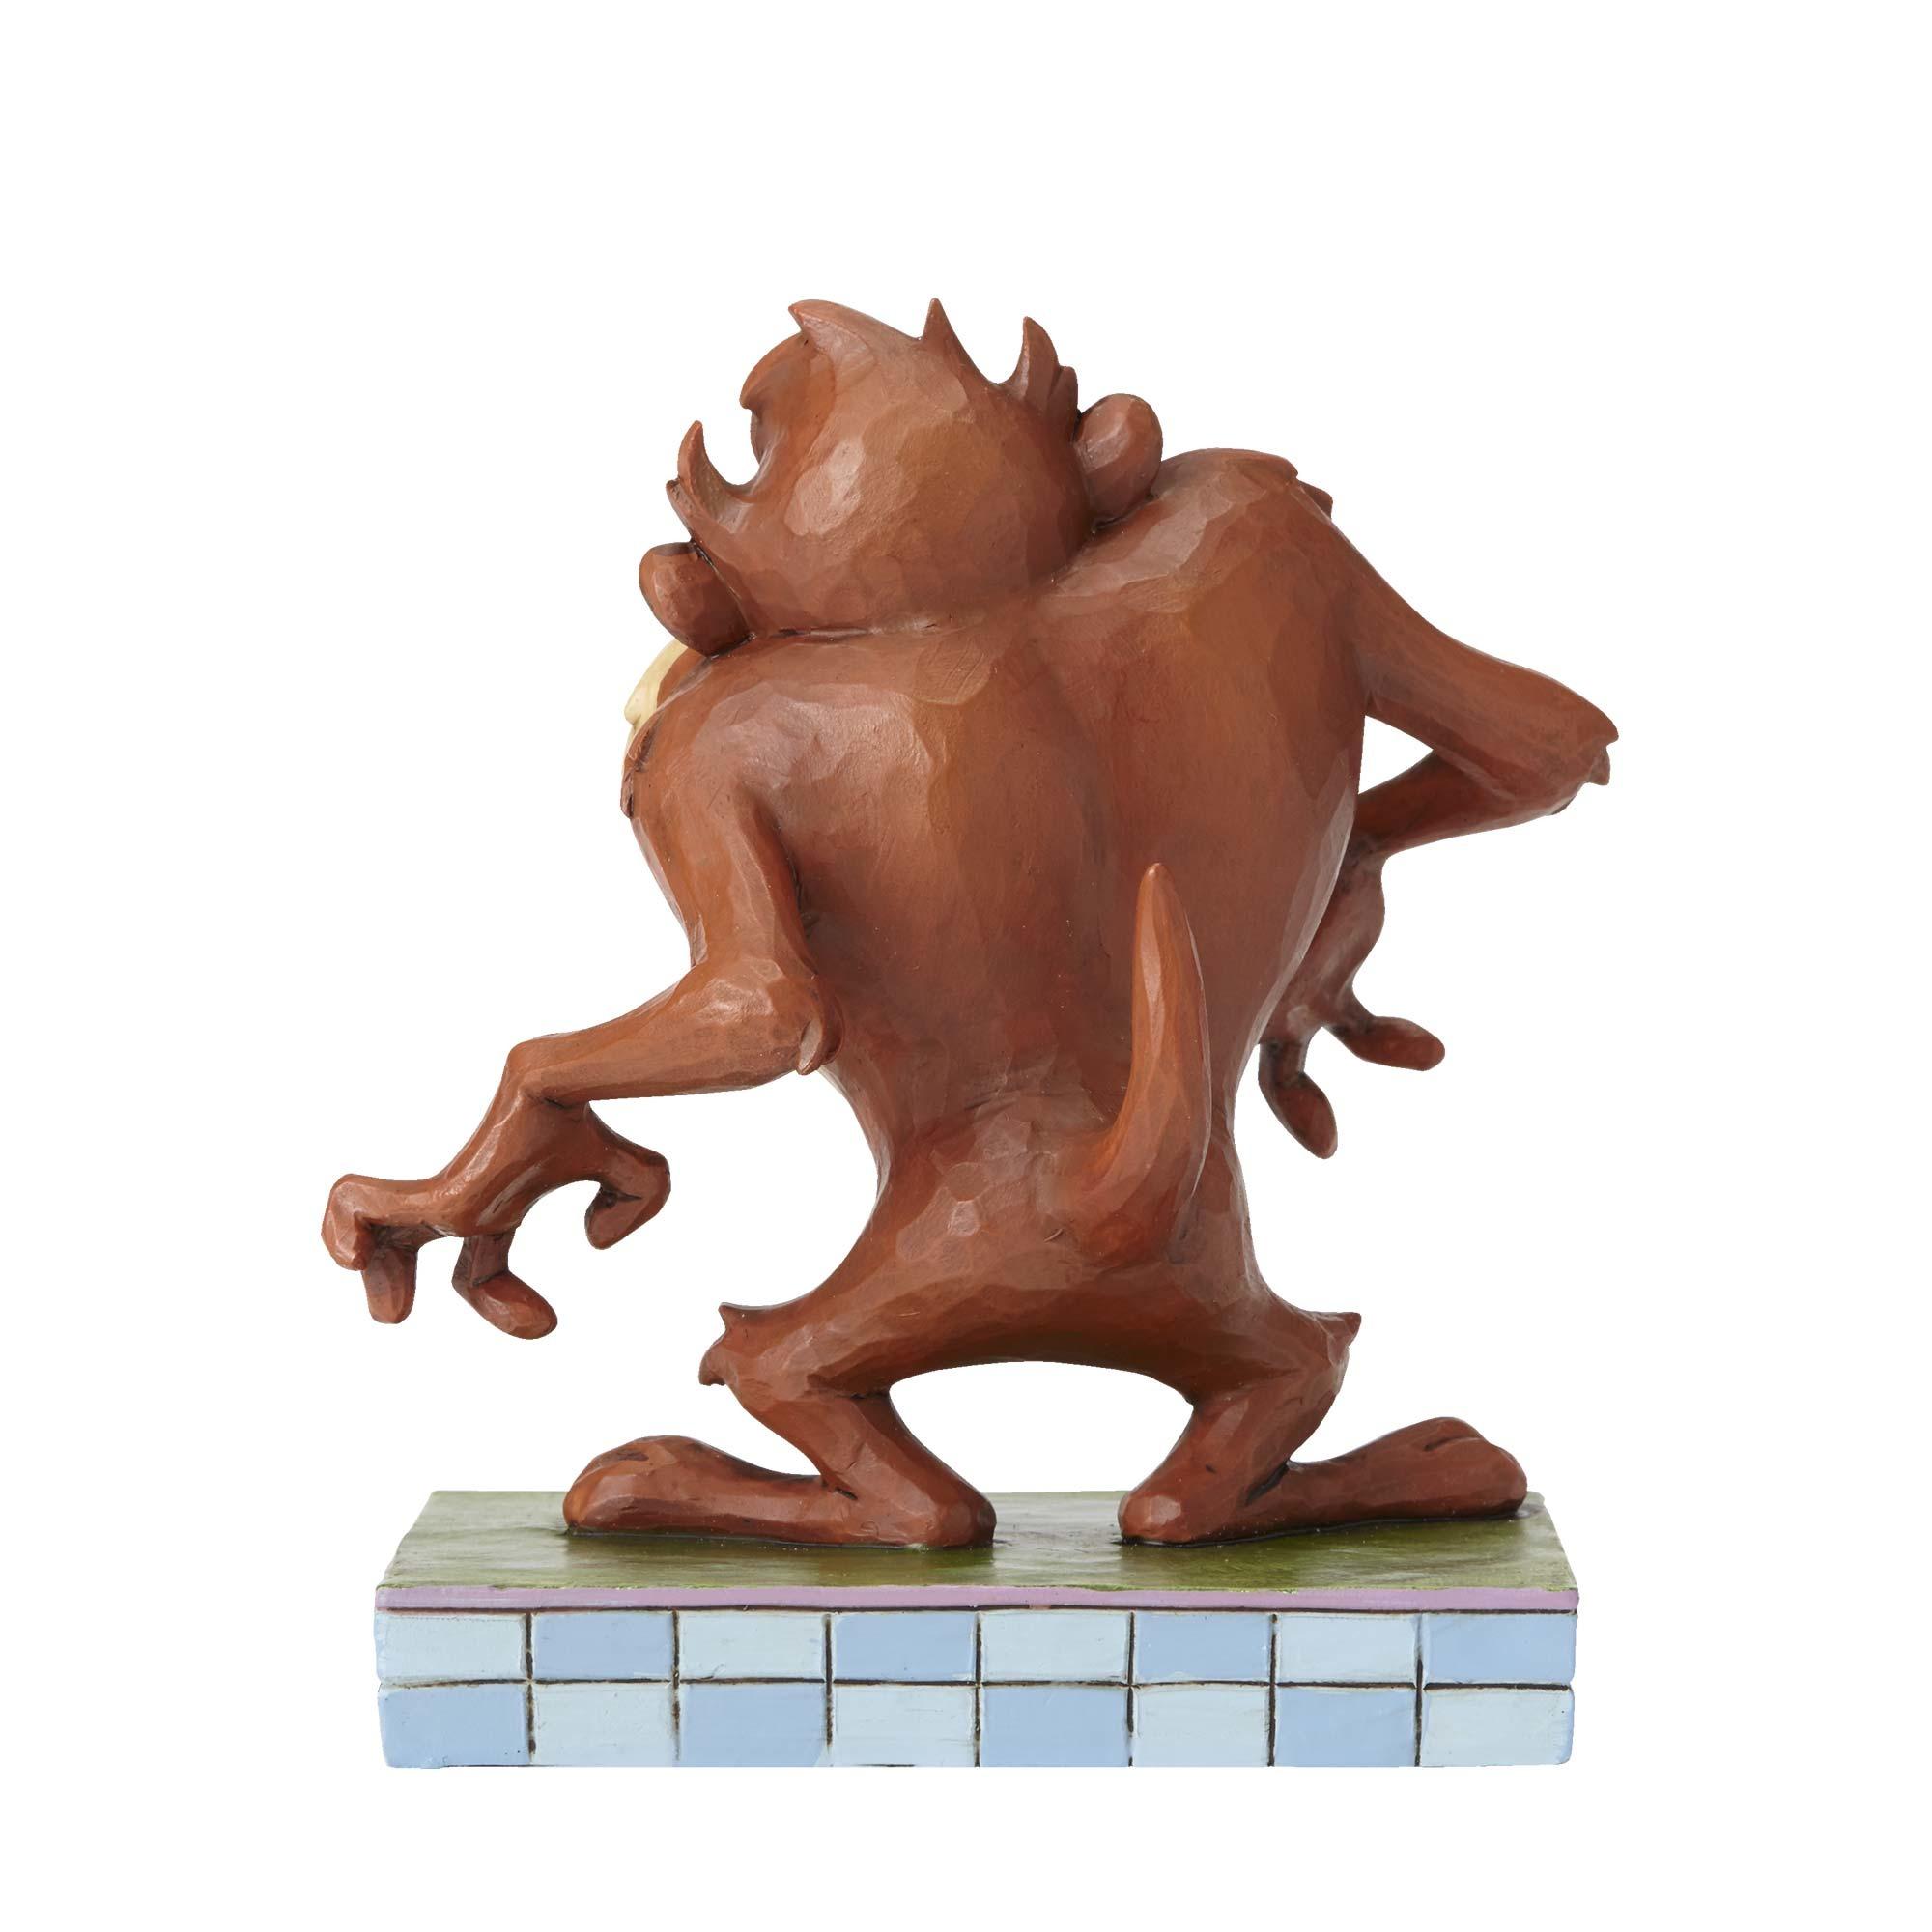 Tasmanian Devil Looney Tunes Figurine by Jim Shore NEW Huh